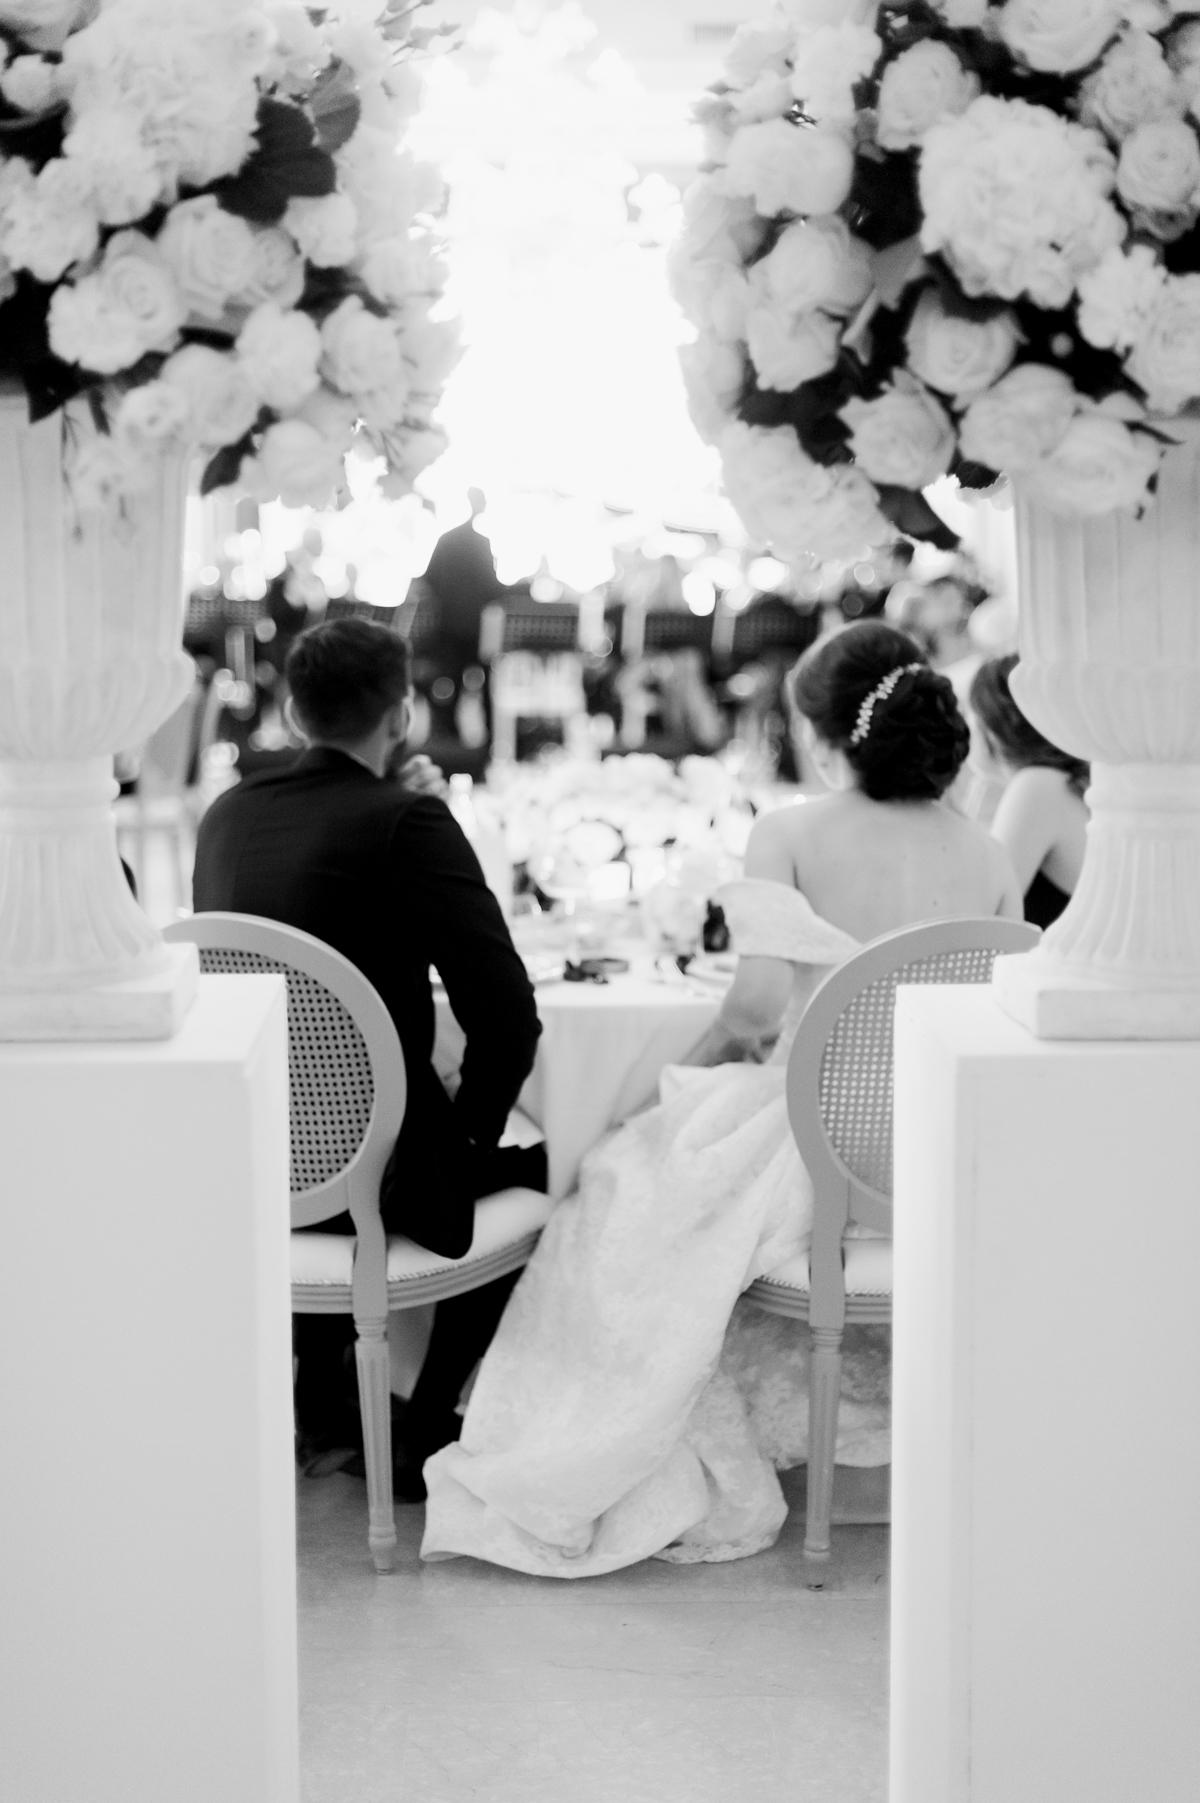 Palace_Villa_Cortine_Hotel_Italian_Wedding_Photographer_Sirmione_AKP-45.jpg